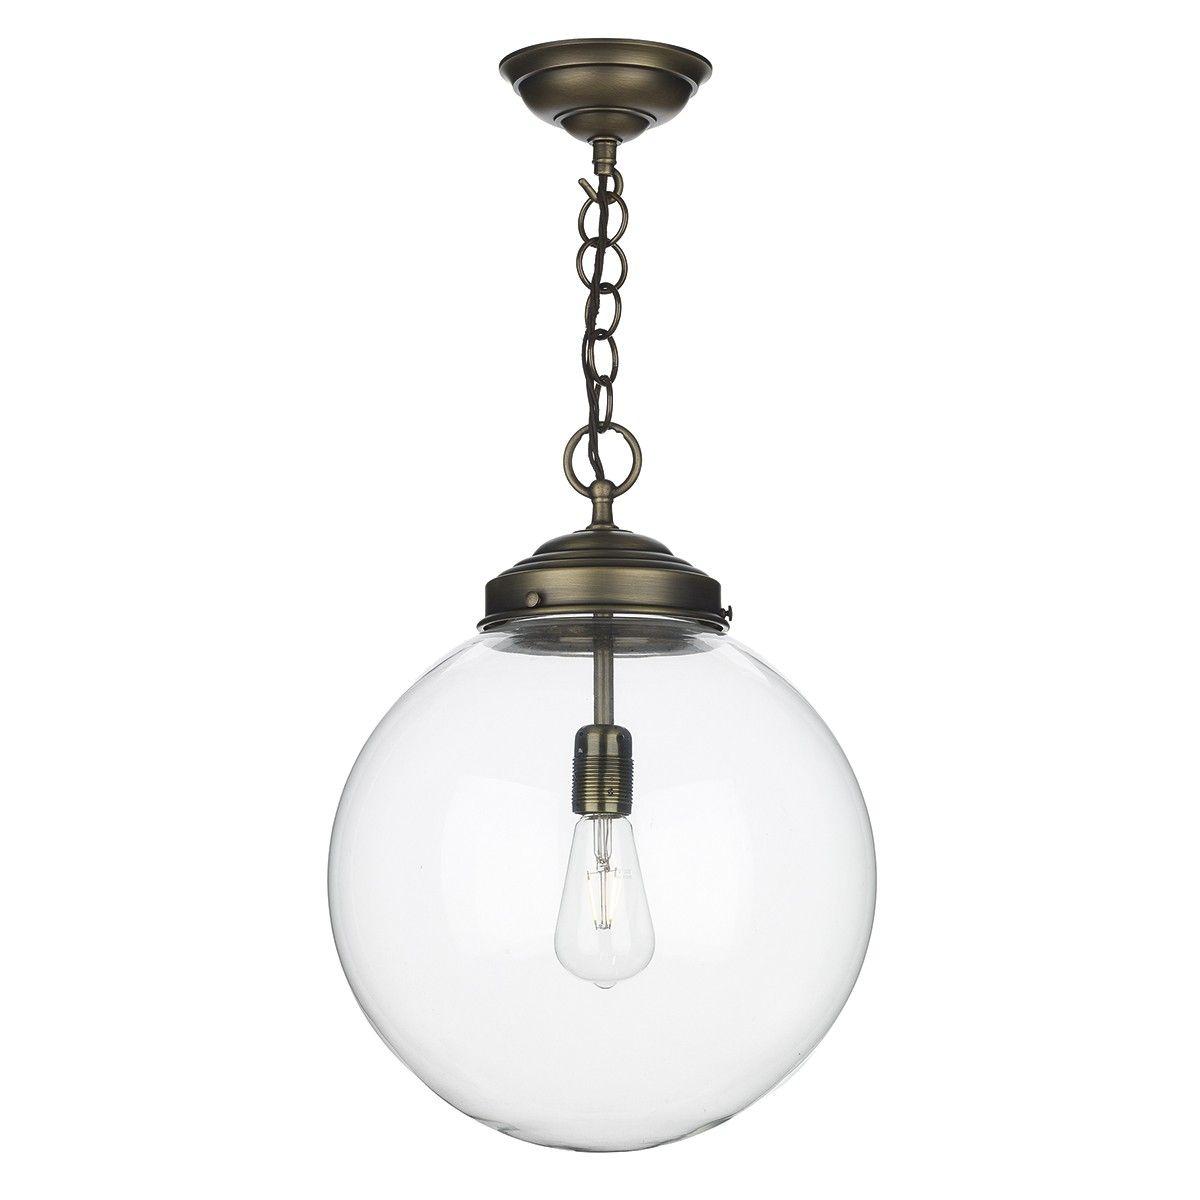 David Hunt Lighting Fairfax Light Brass